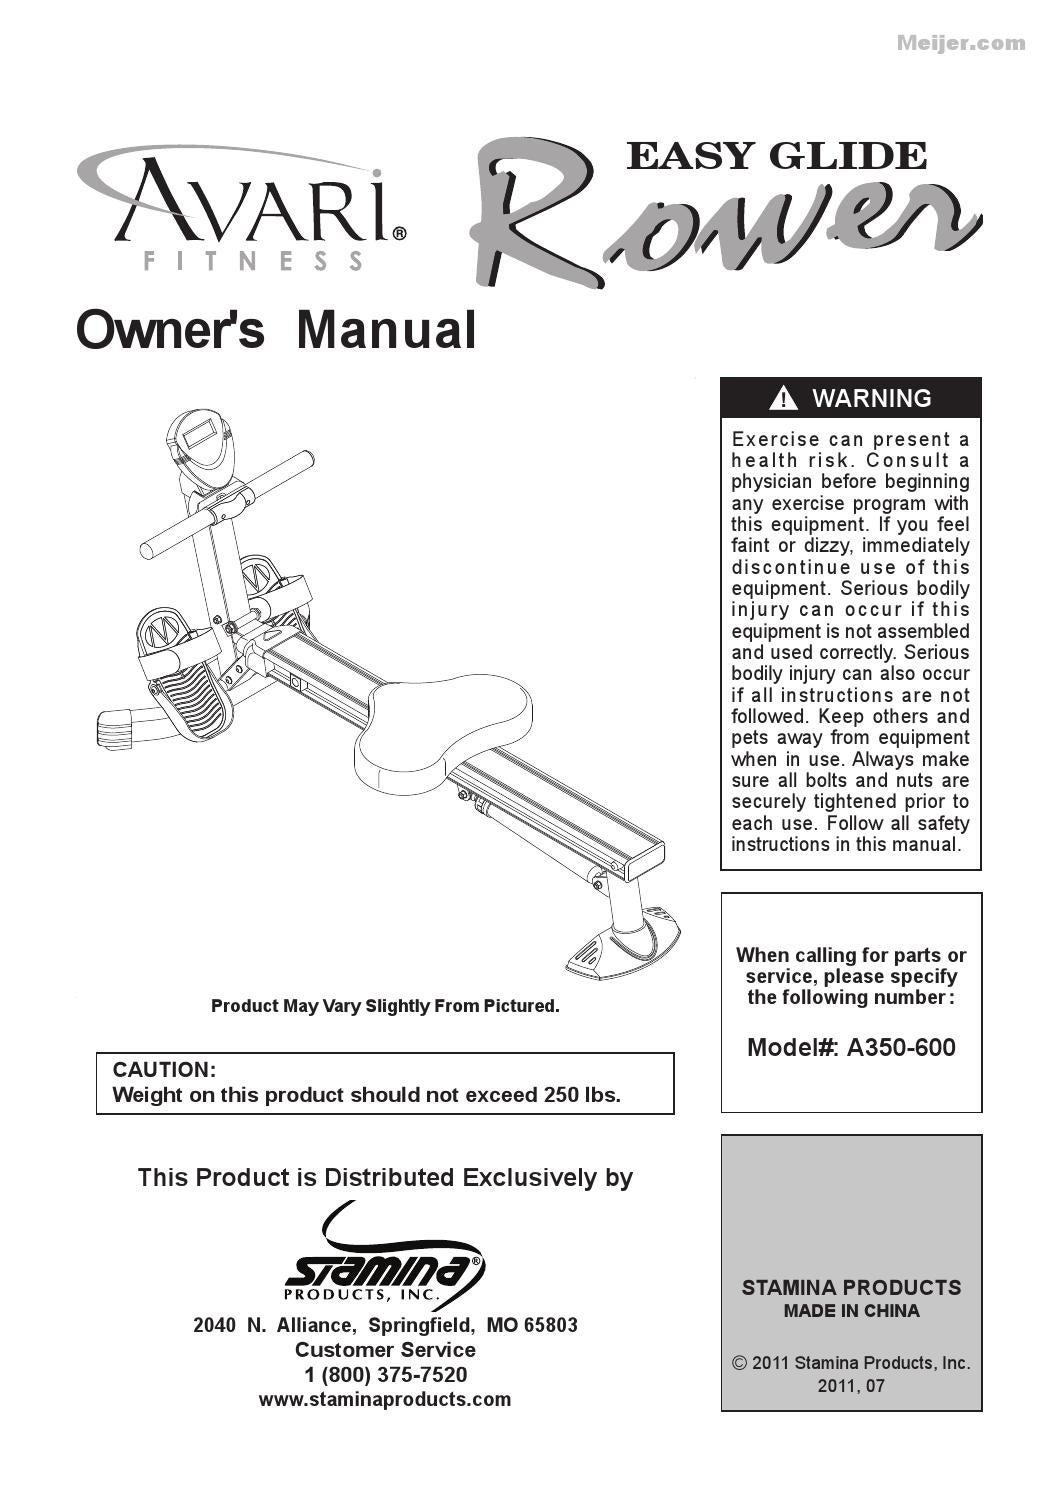 avari easy glide rower manual